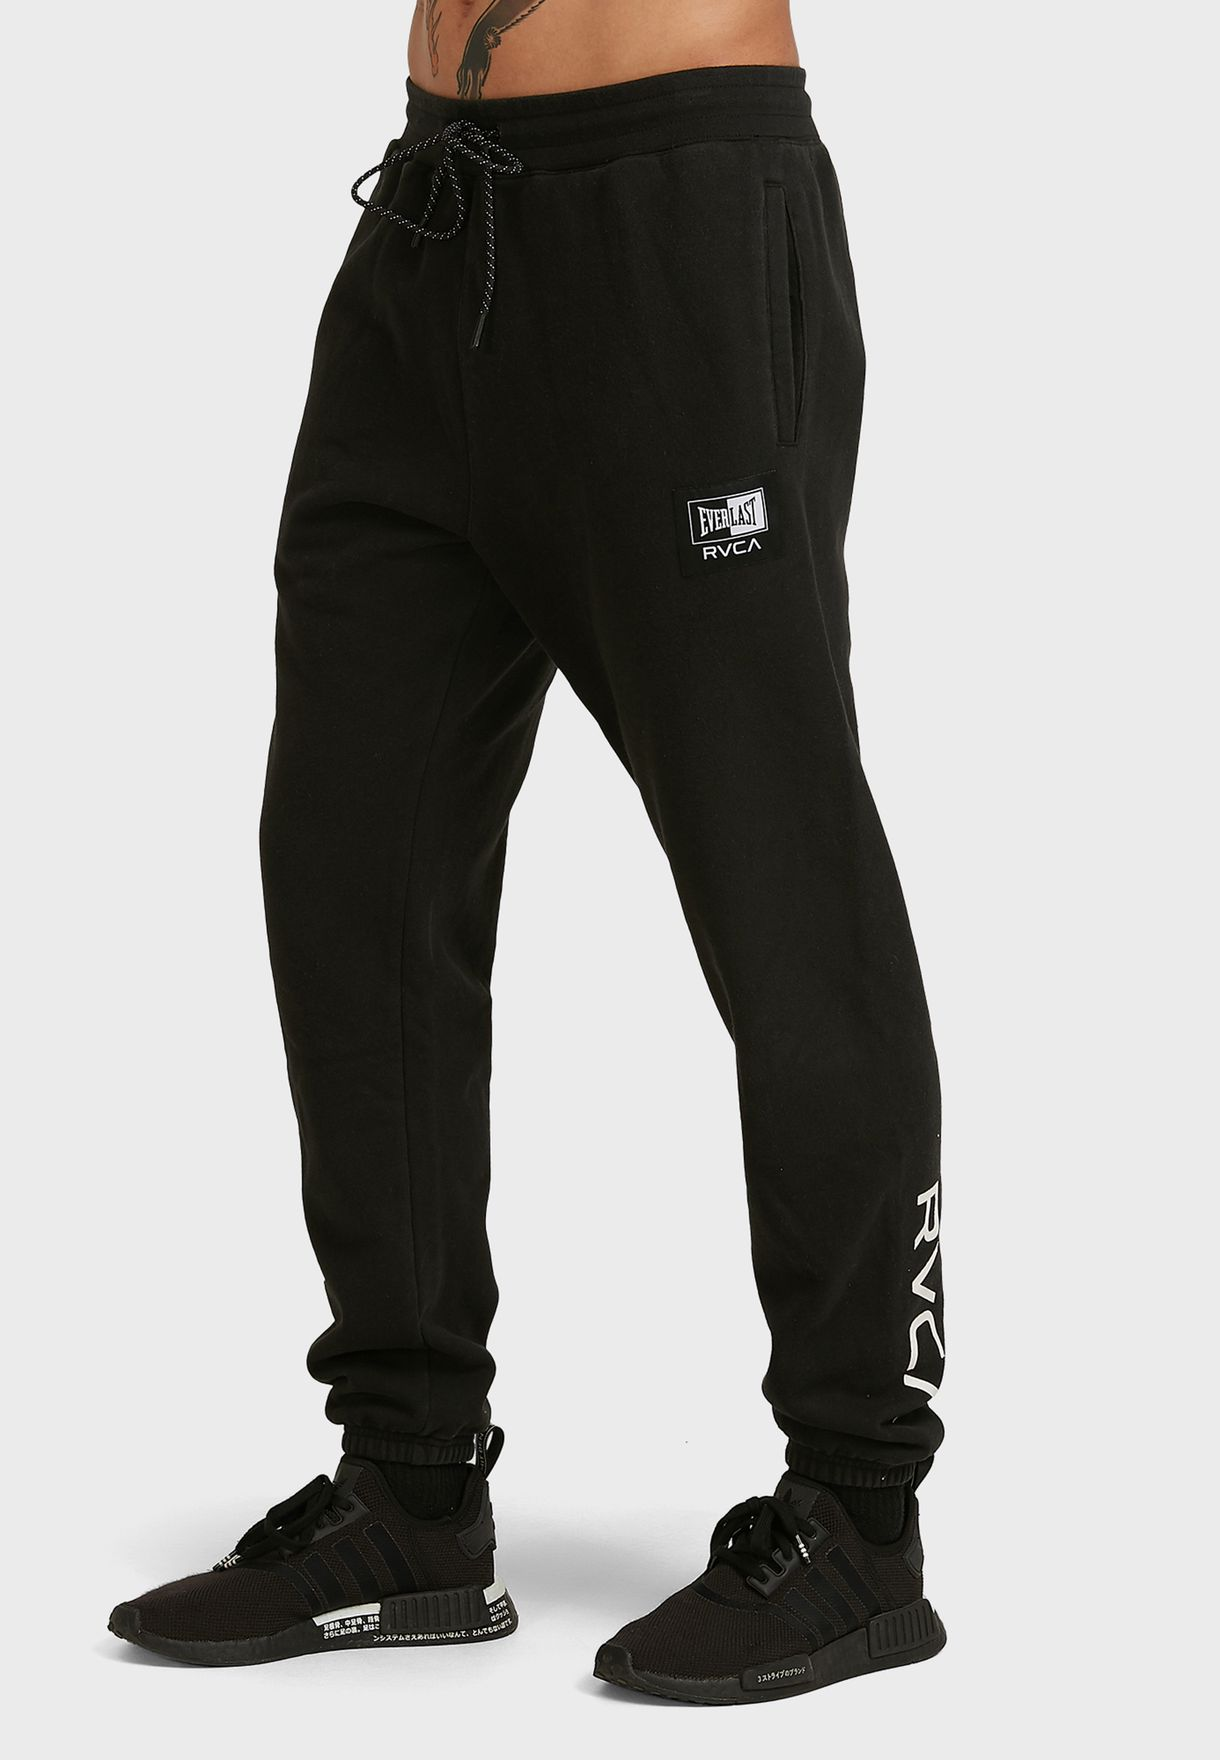 Everlast Sweatpants